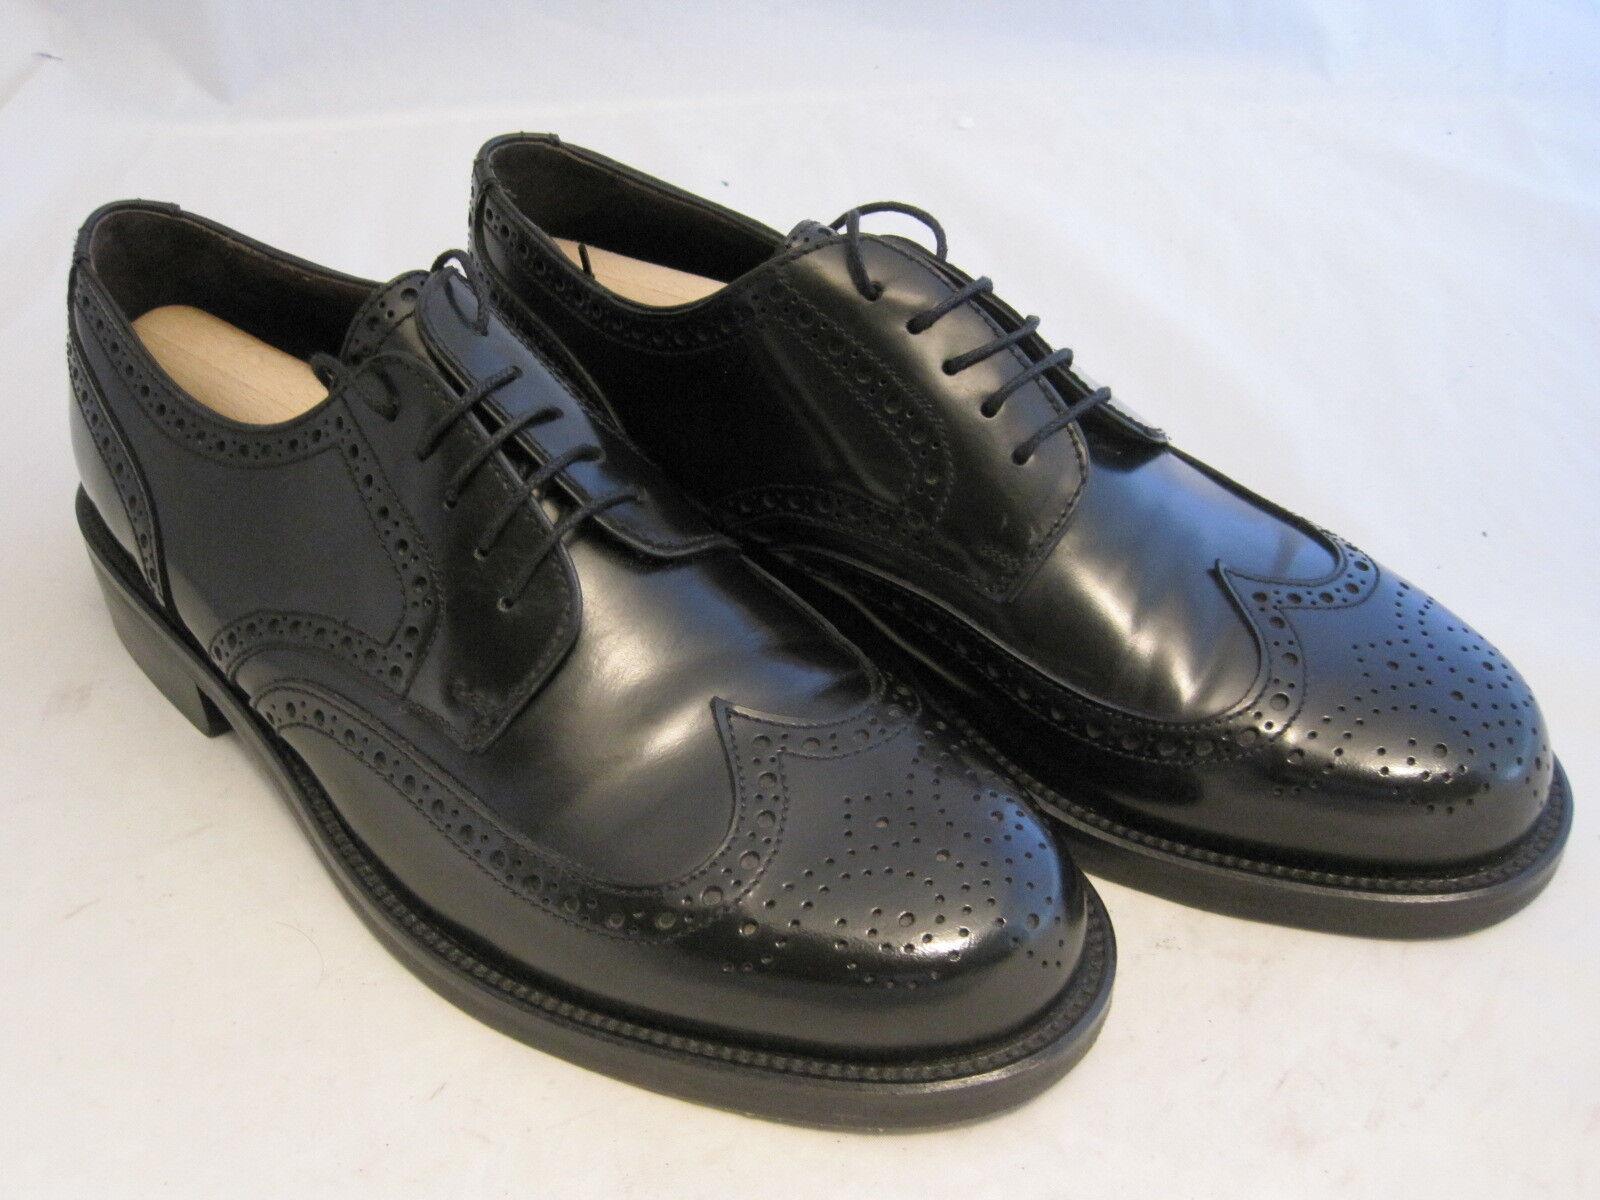 Bagatto zapatos caballero en 43,5 UK 9 como nuevo negro np